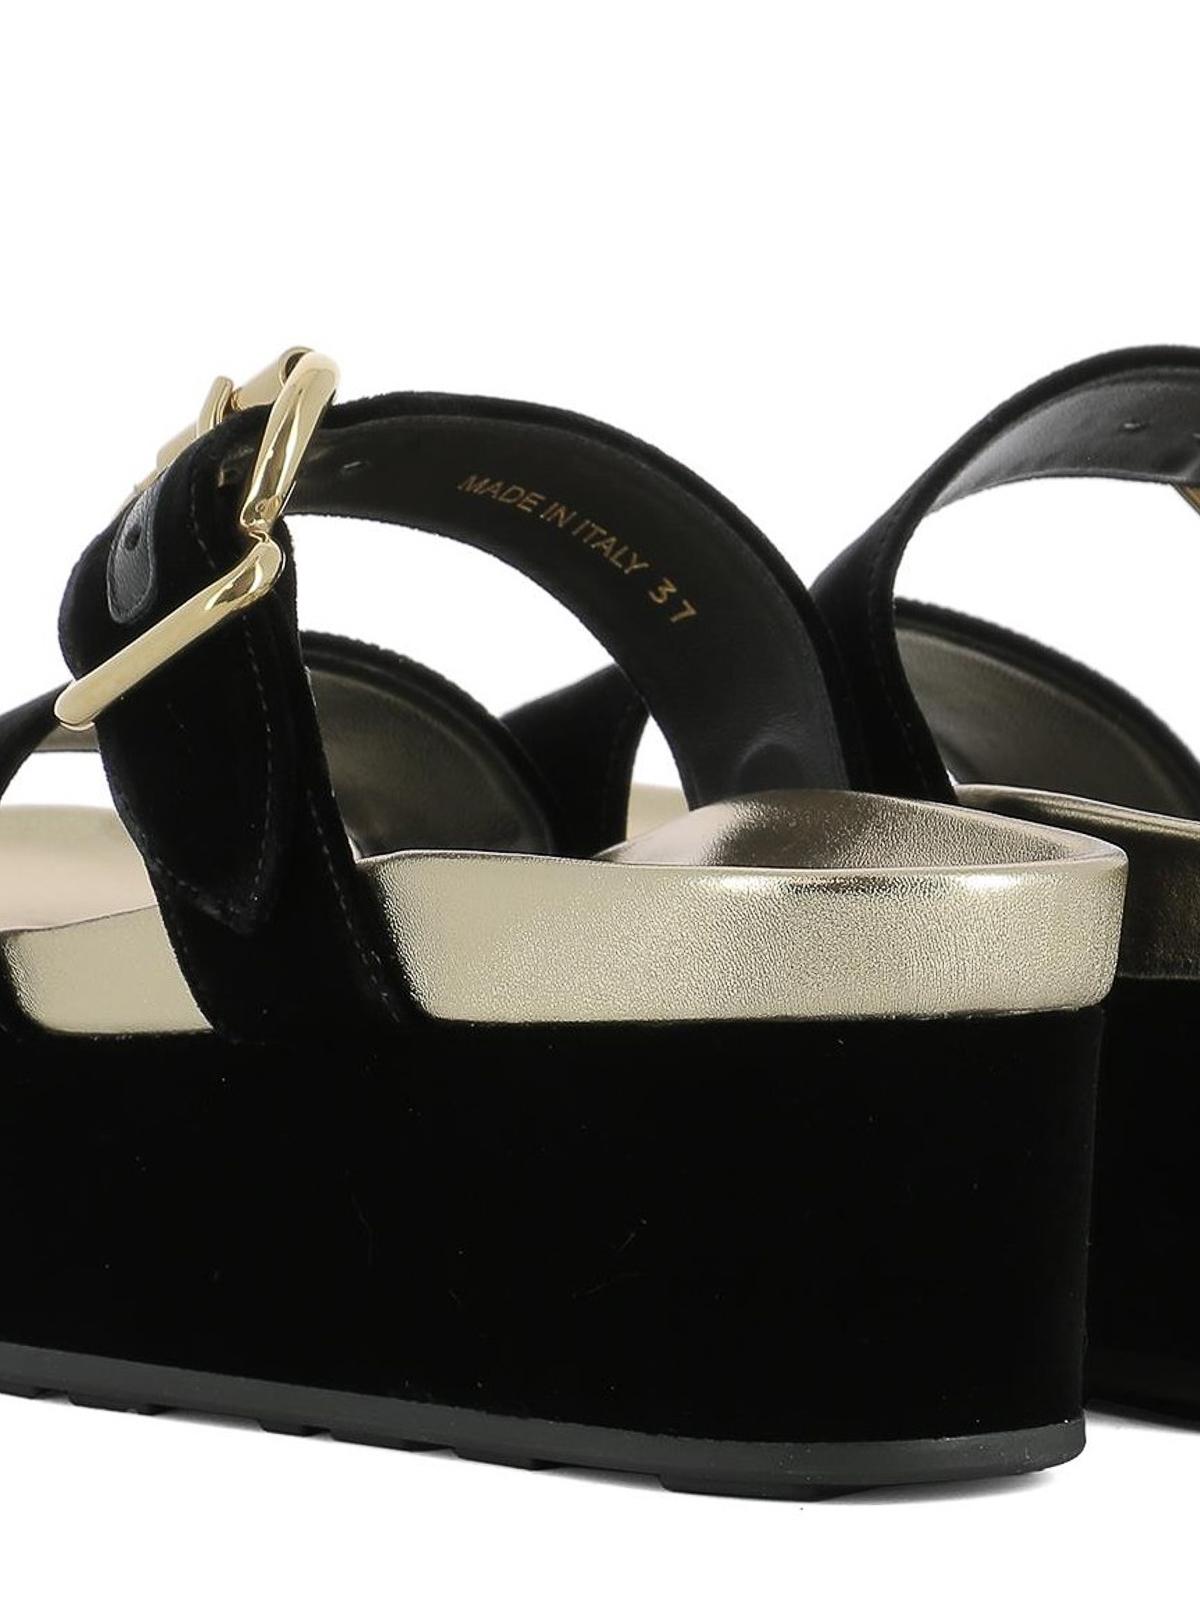 7eea078f6ae Prada - Buckled velvet platform sandals - sandals - 1XZ640F040LSZF0002